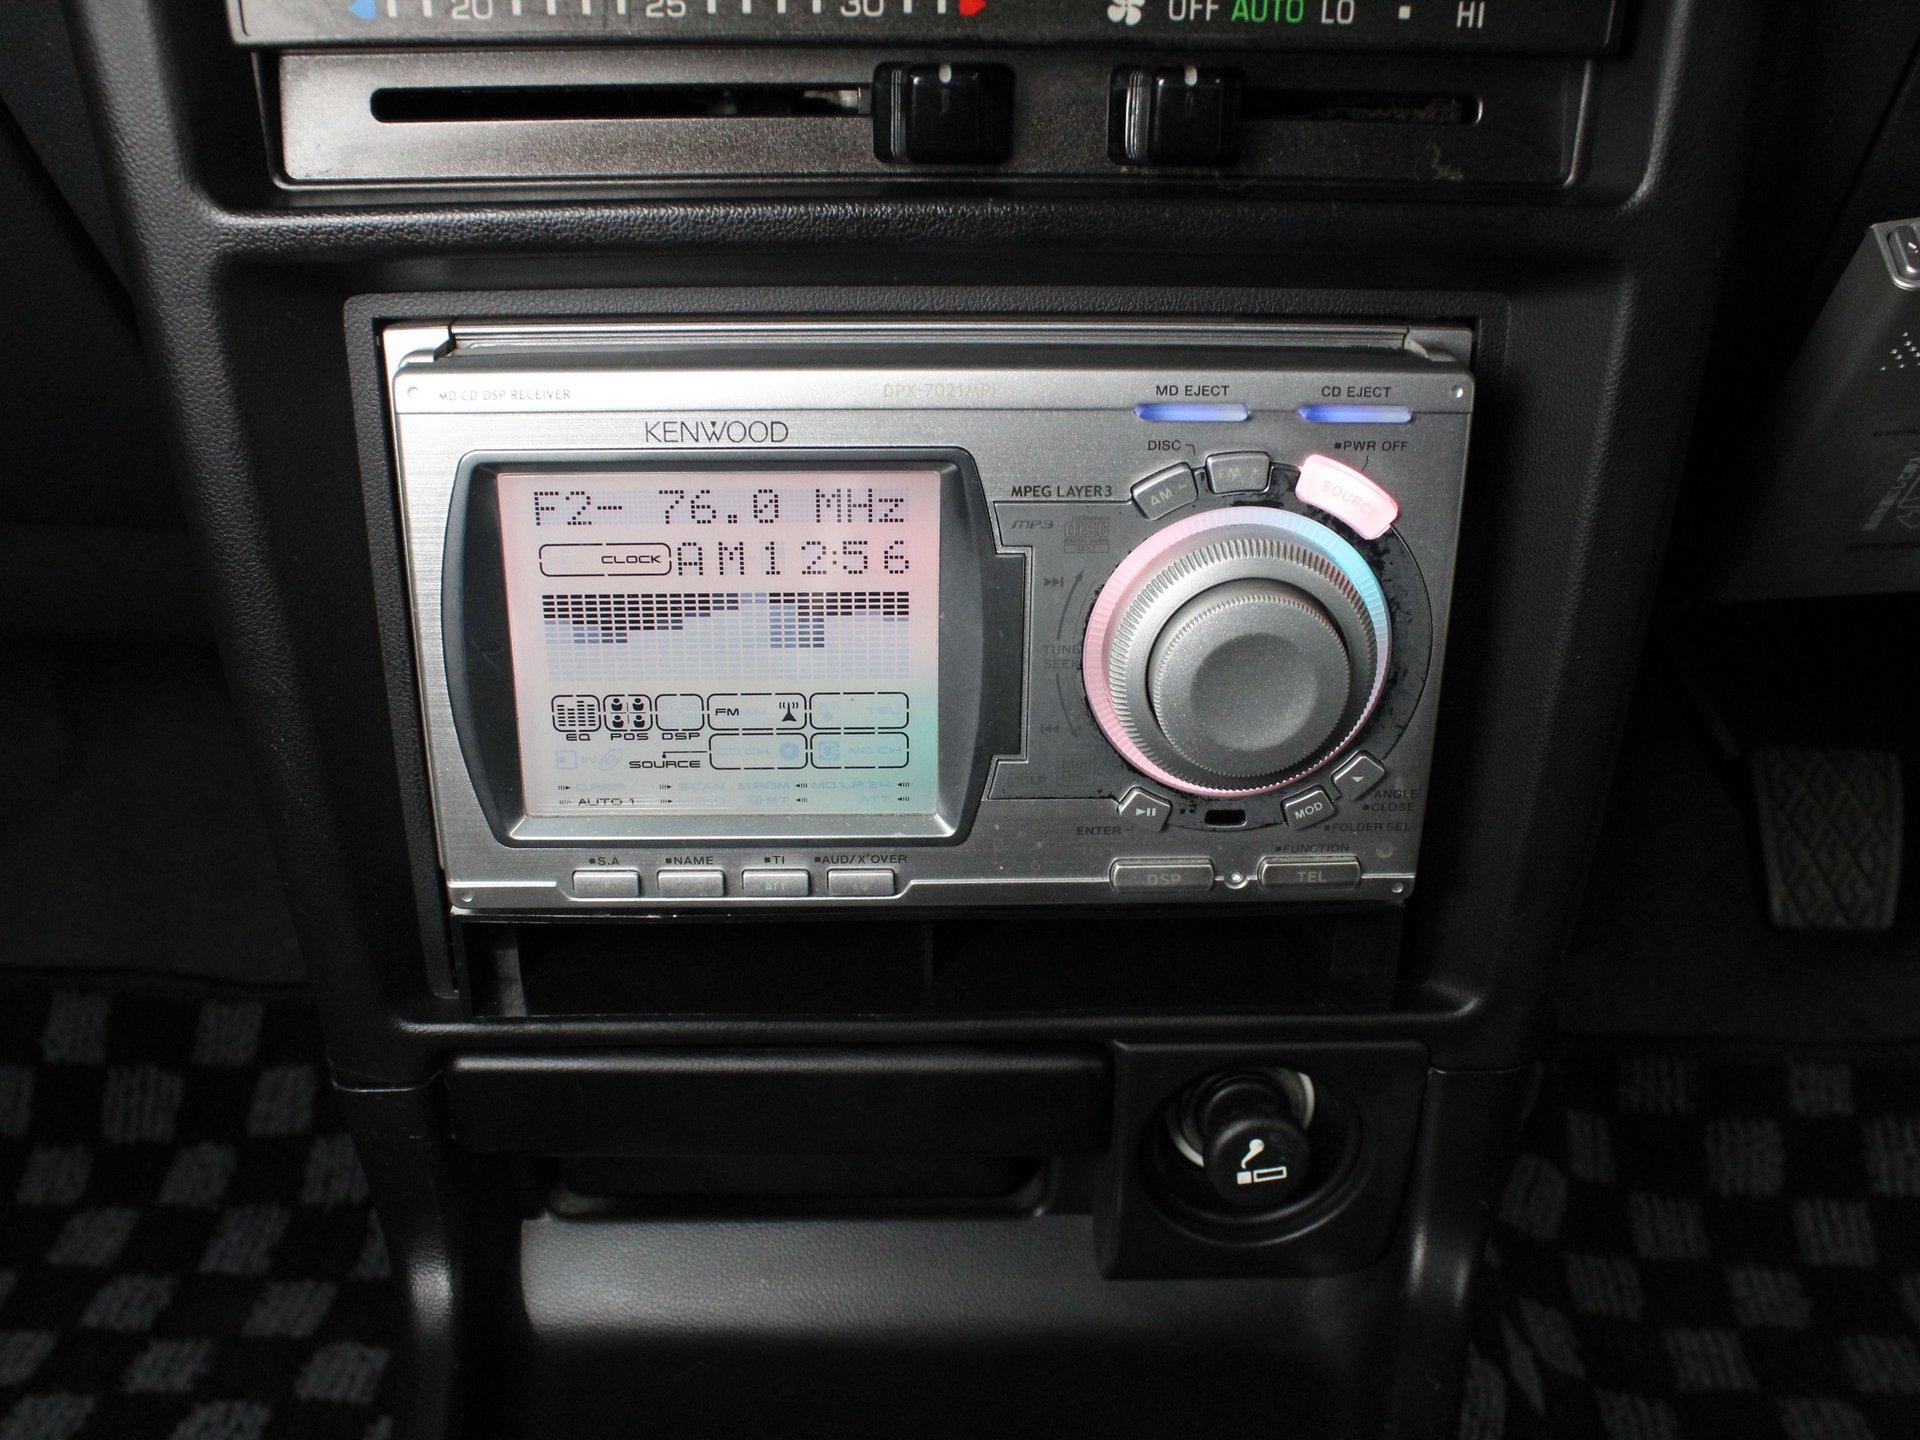 1989 Toyota Levin